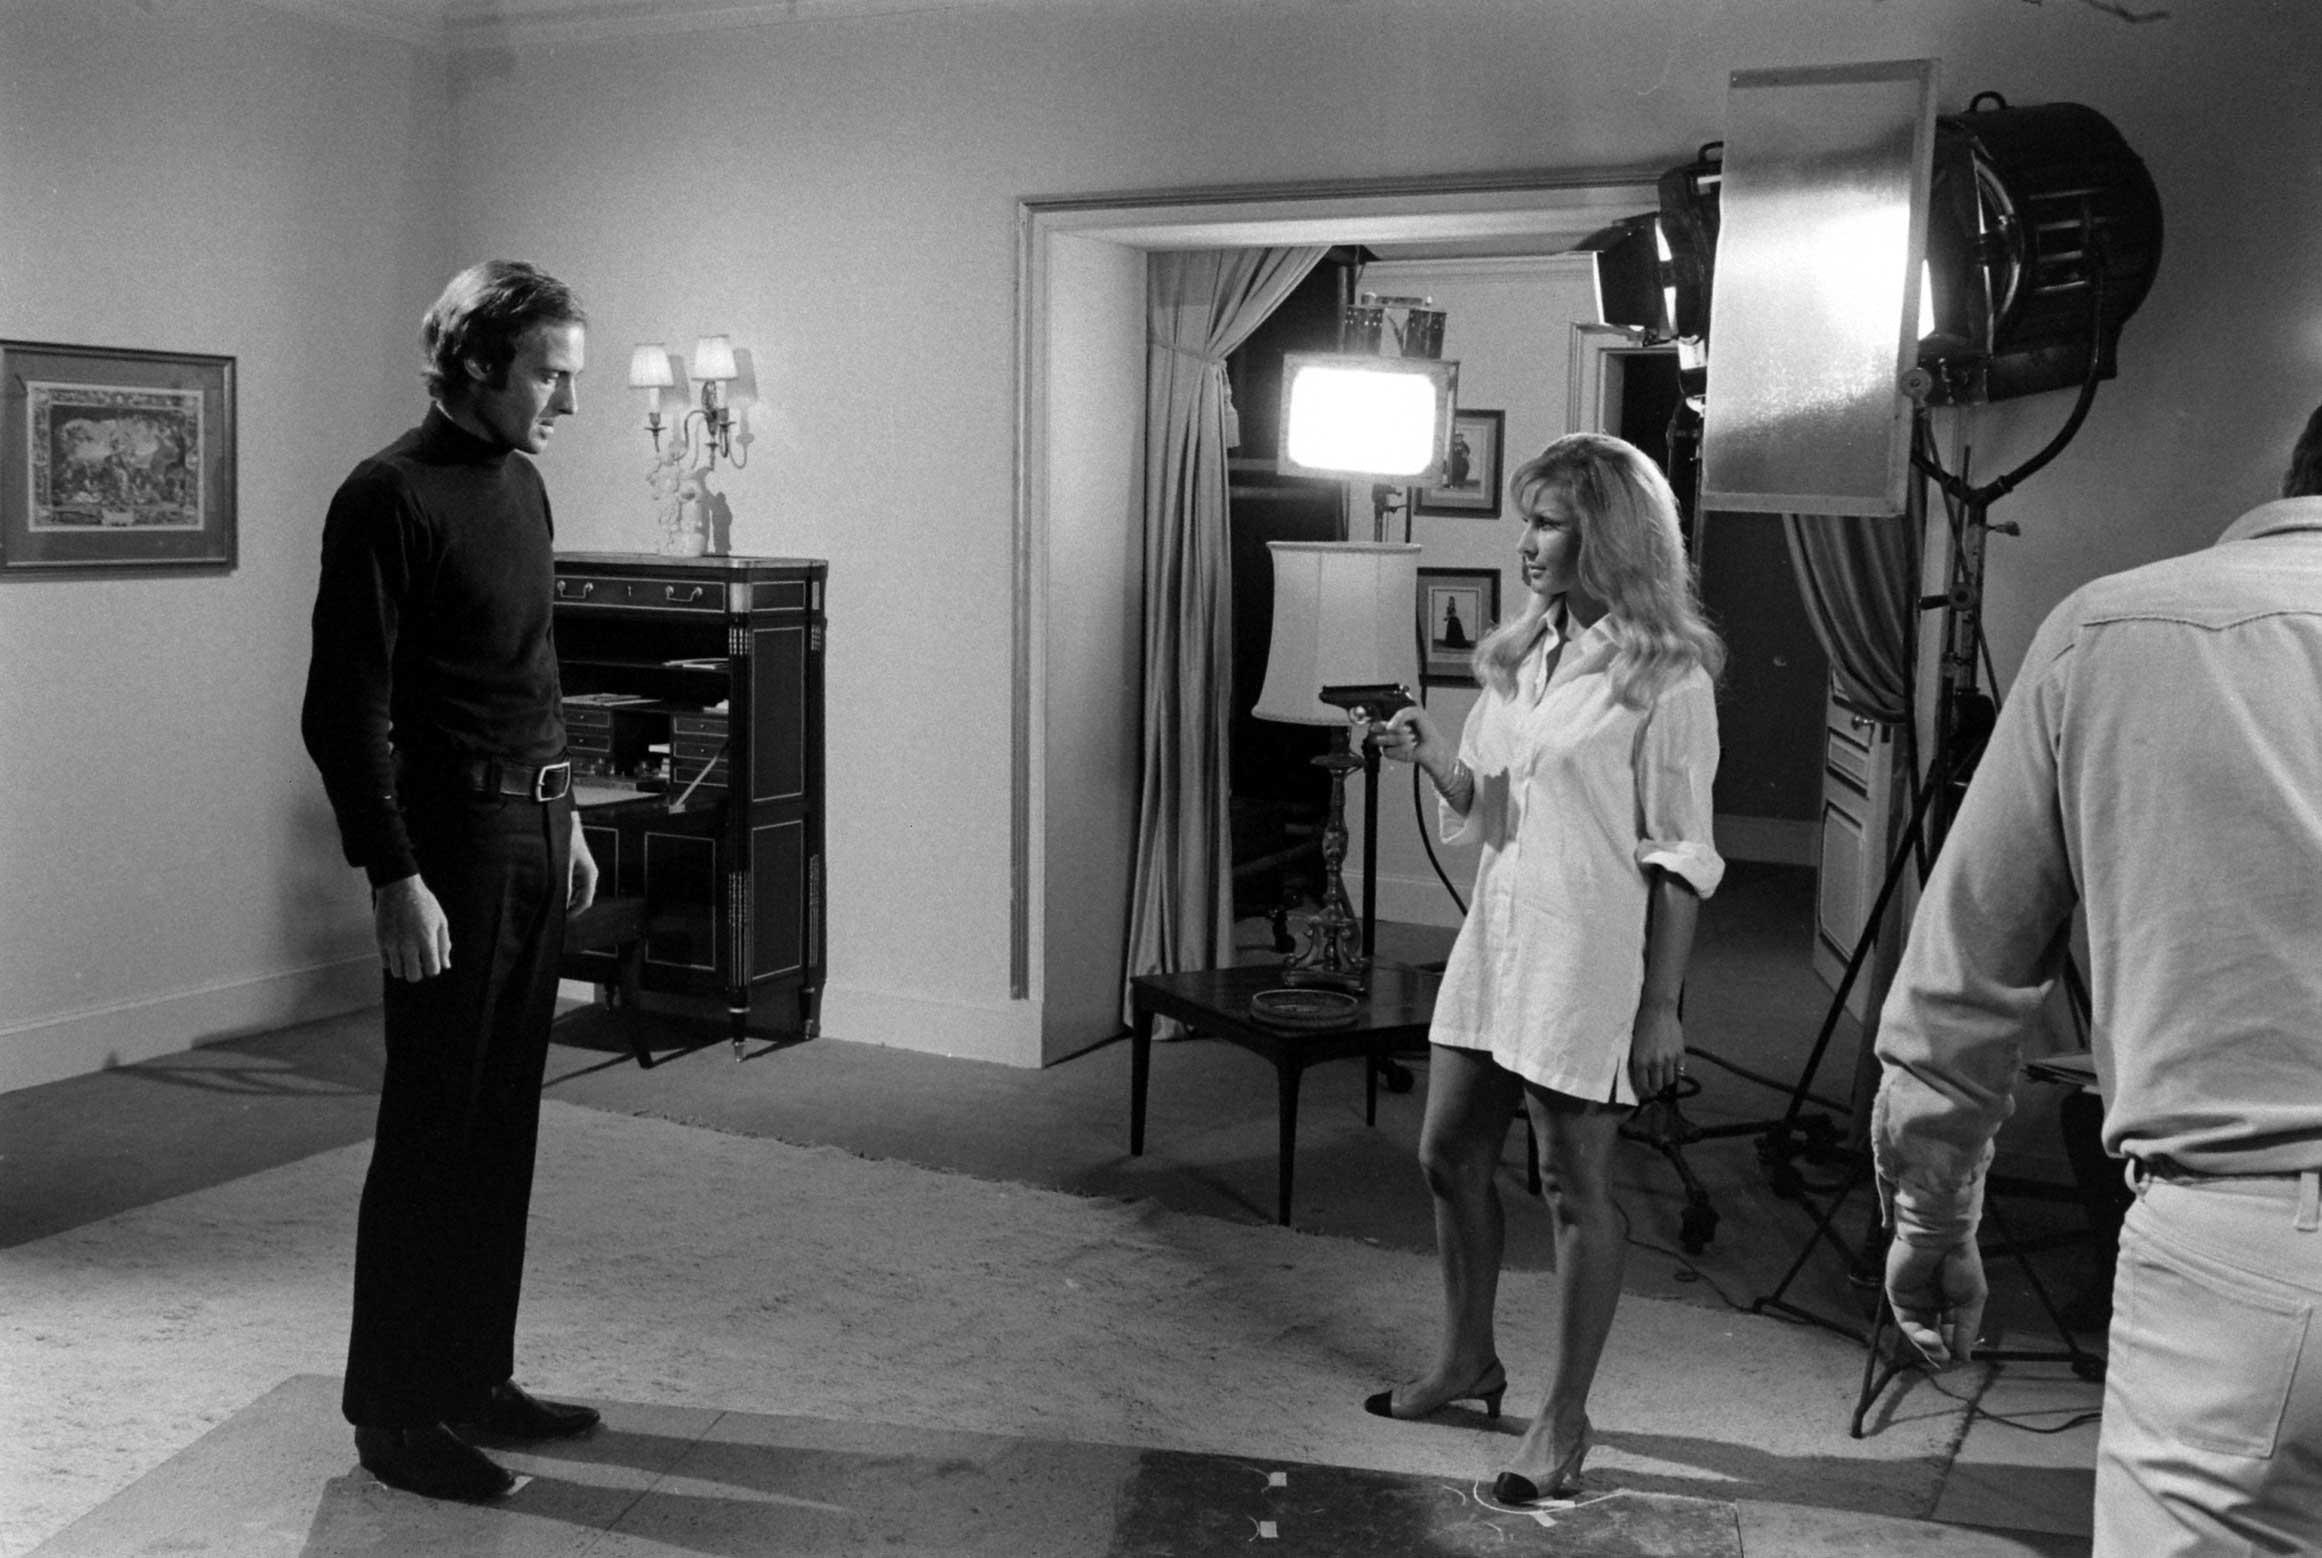 John Richardson reacts as his screen-test costar pulls out a gun, 1967.